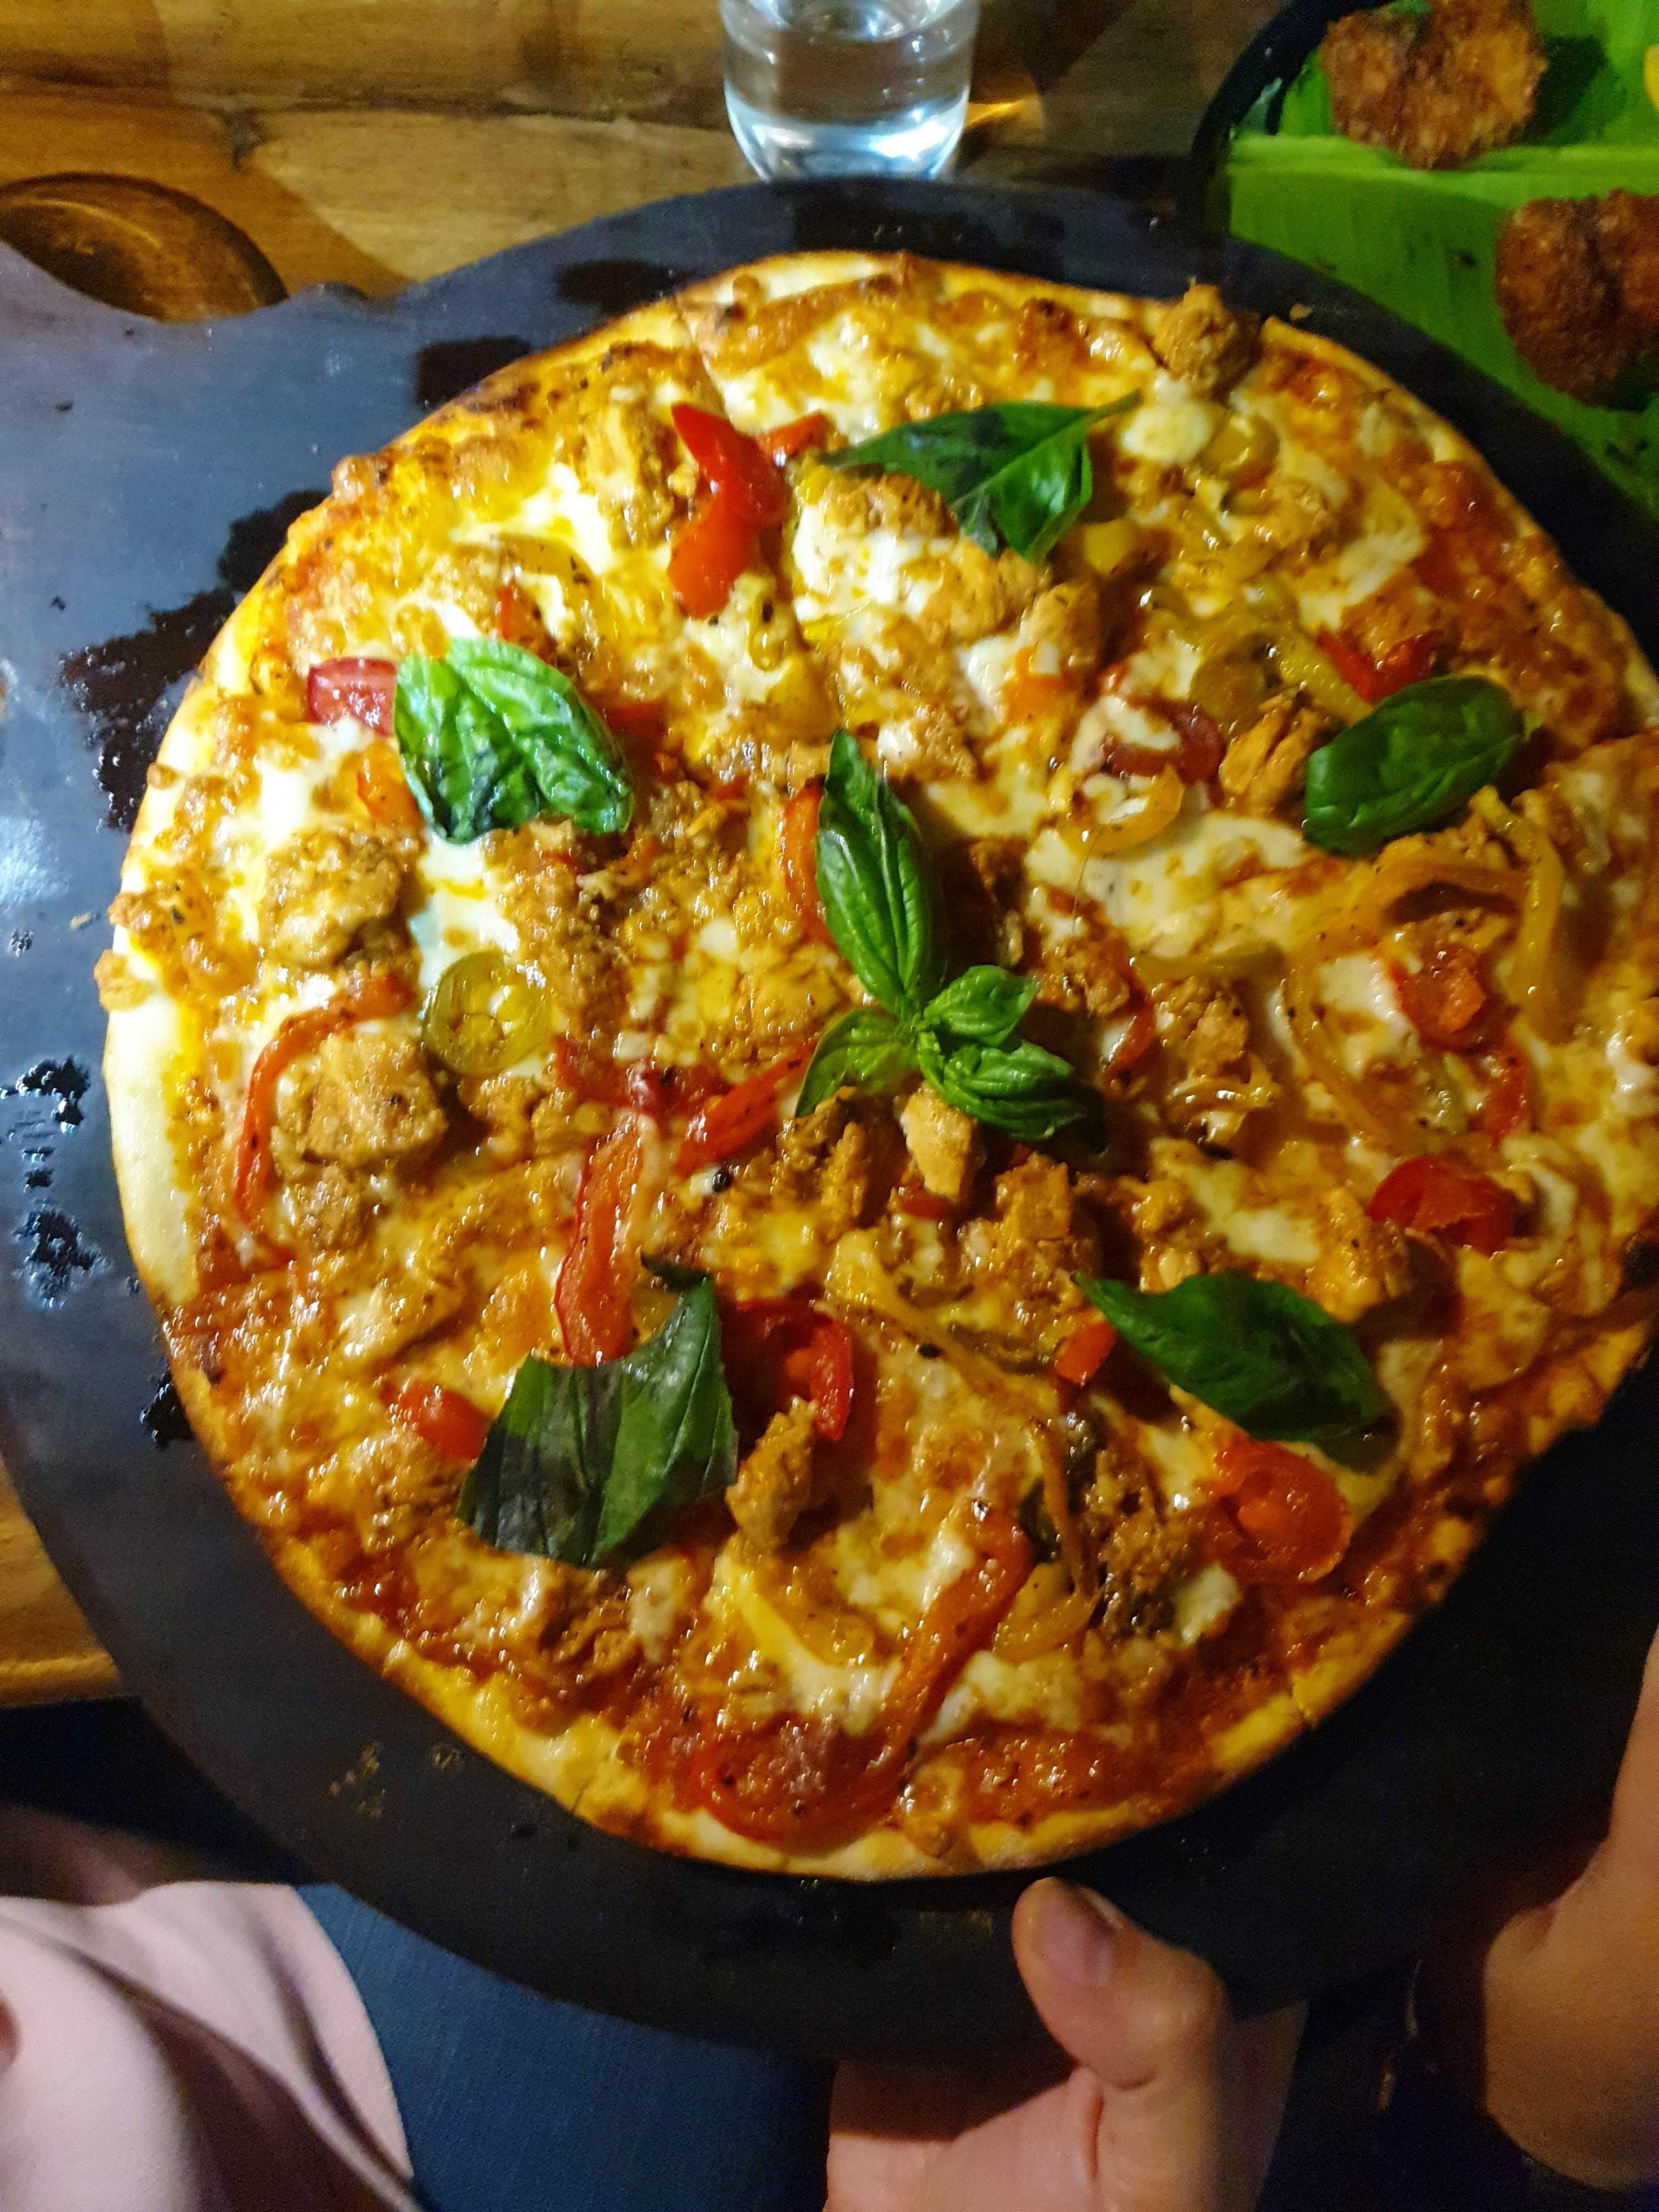 Dish,Food,Cuisine,Ingredient,Frittata,Italian food,Pizza,California-style pizza,Meat,Produce